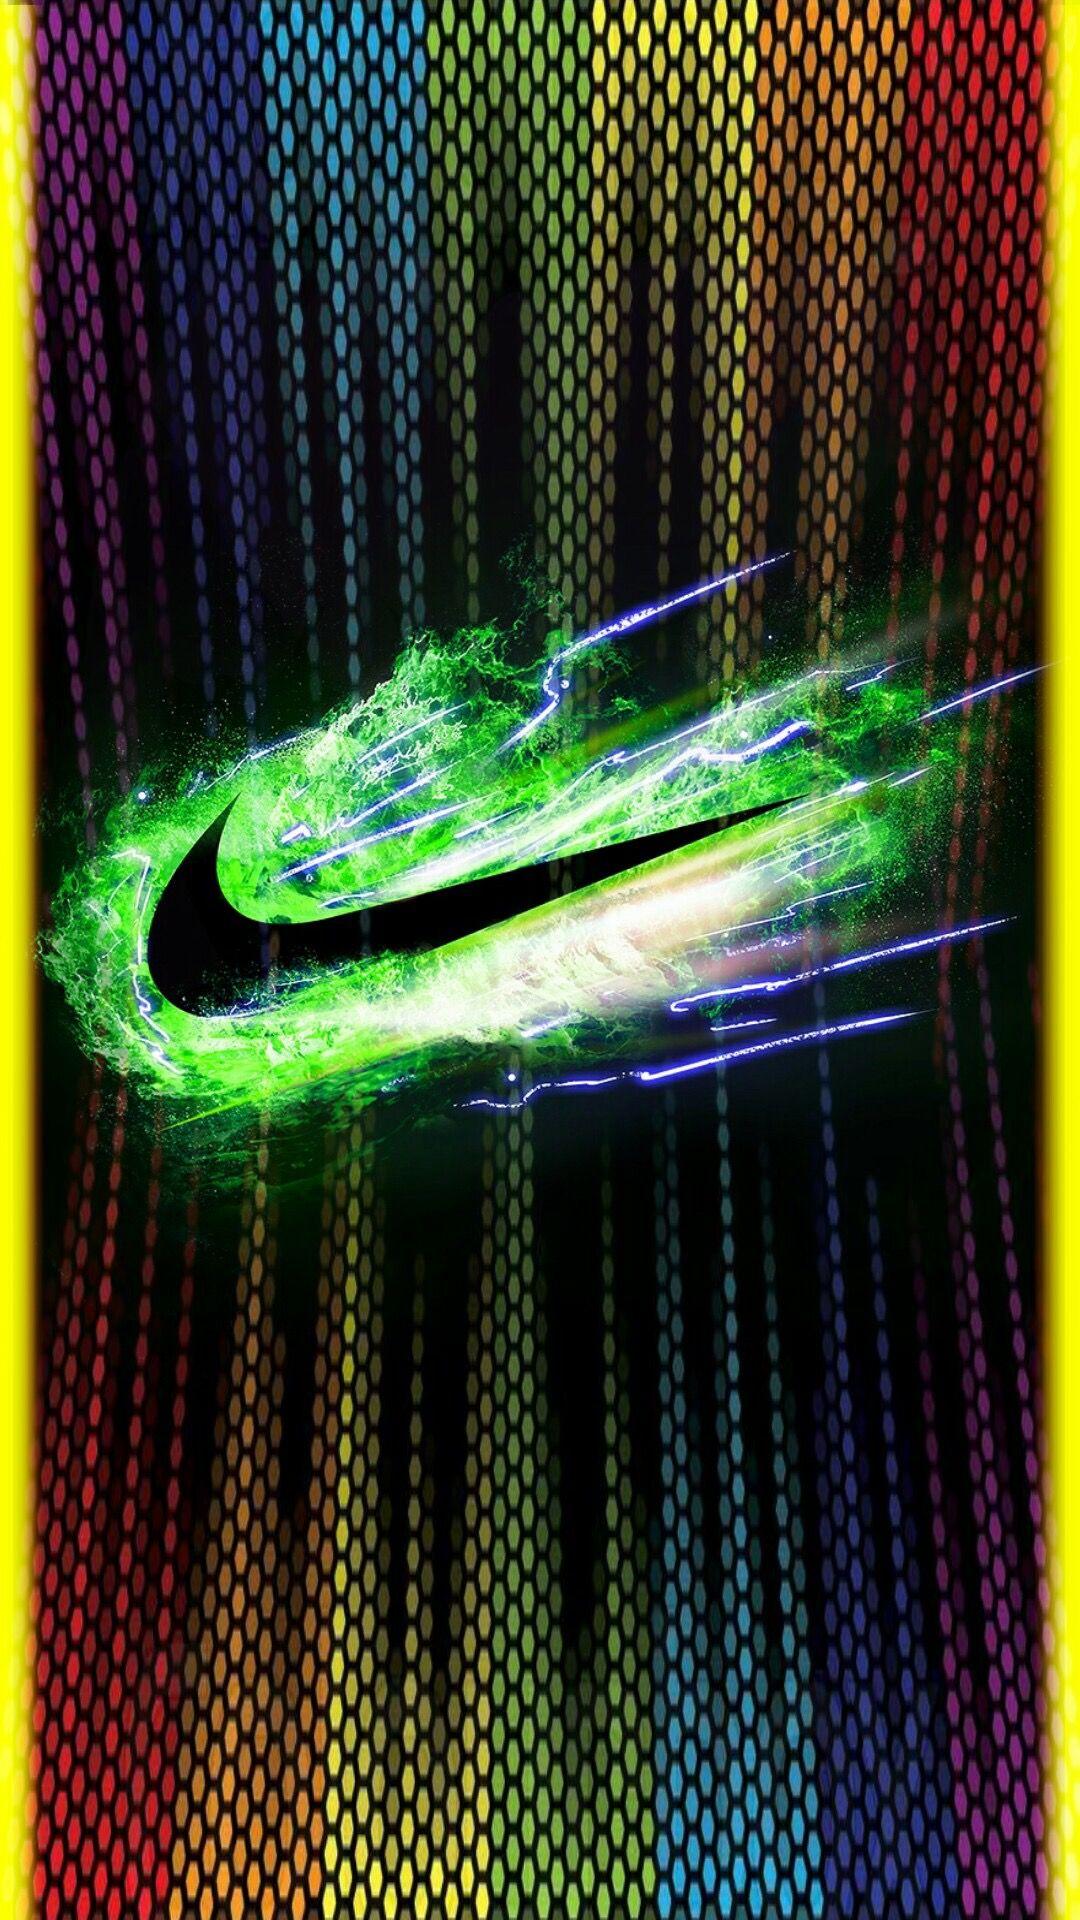 Stupenda Immagine Nike Wallpaper Adidas Wallpapers Nike Art